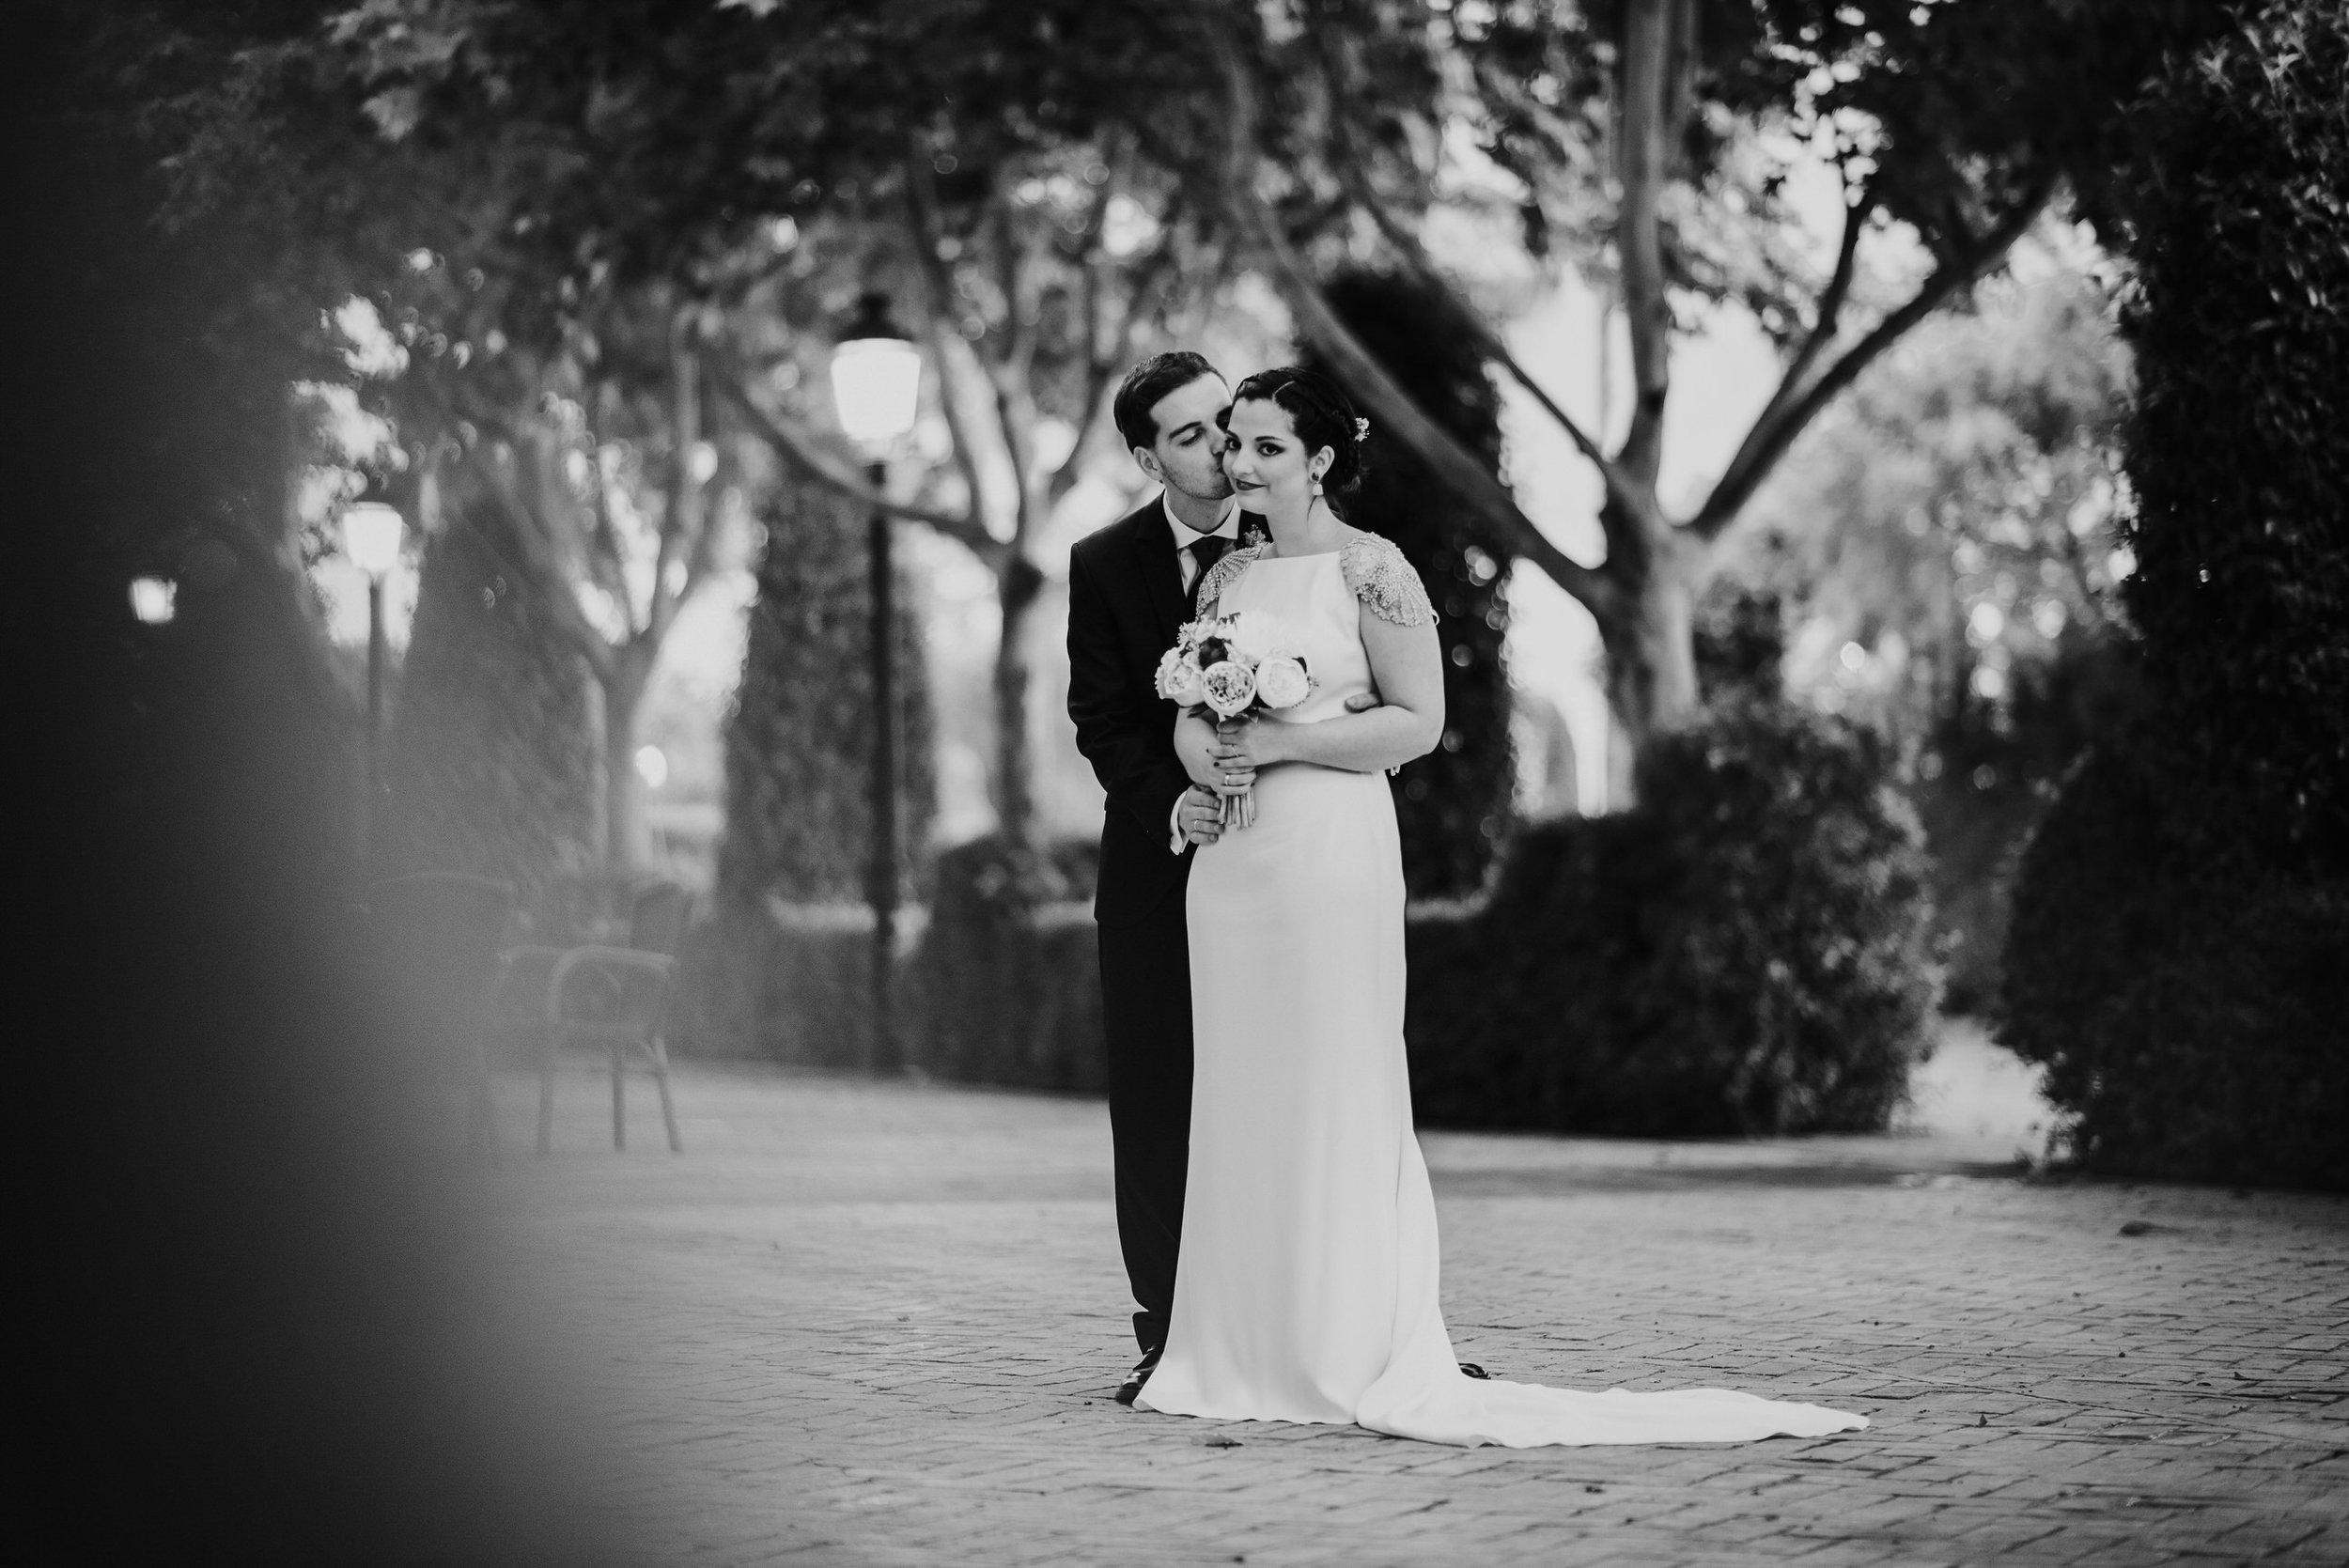 Laura & Rubén - boda en utrera - Santa clotilde- Manolo mayo - Fotografo de boda - Andrés Amarillo AAA_1075-Exposure (91).jpg